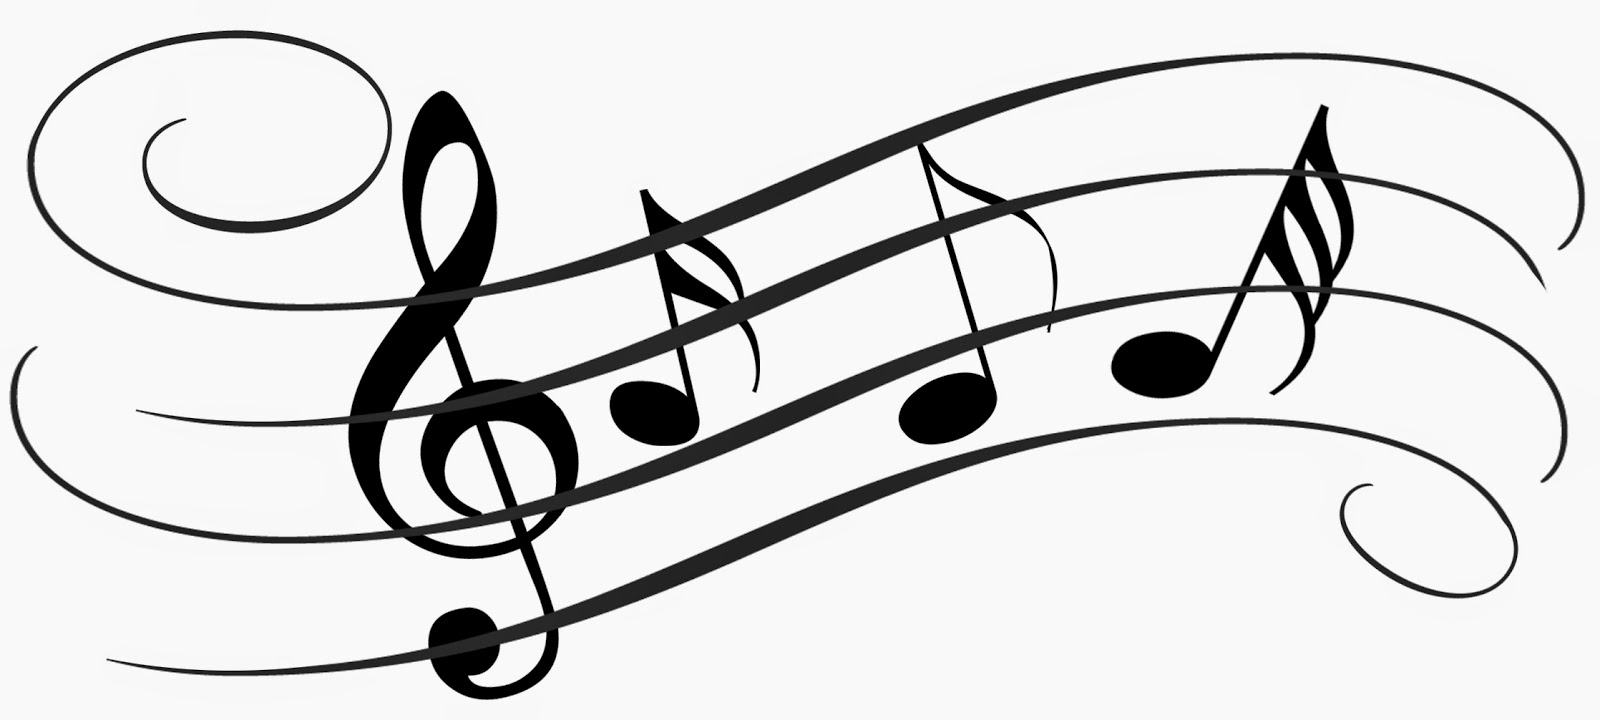 Musical clipart music program #3